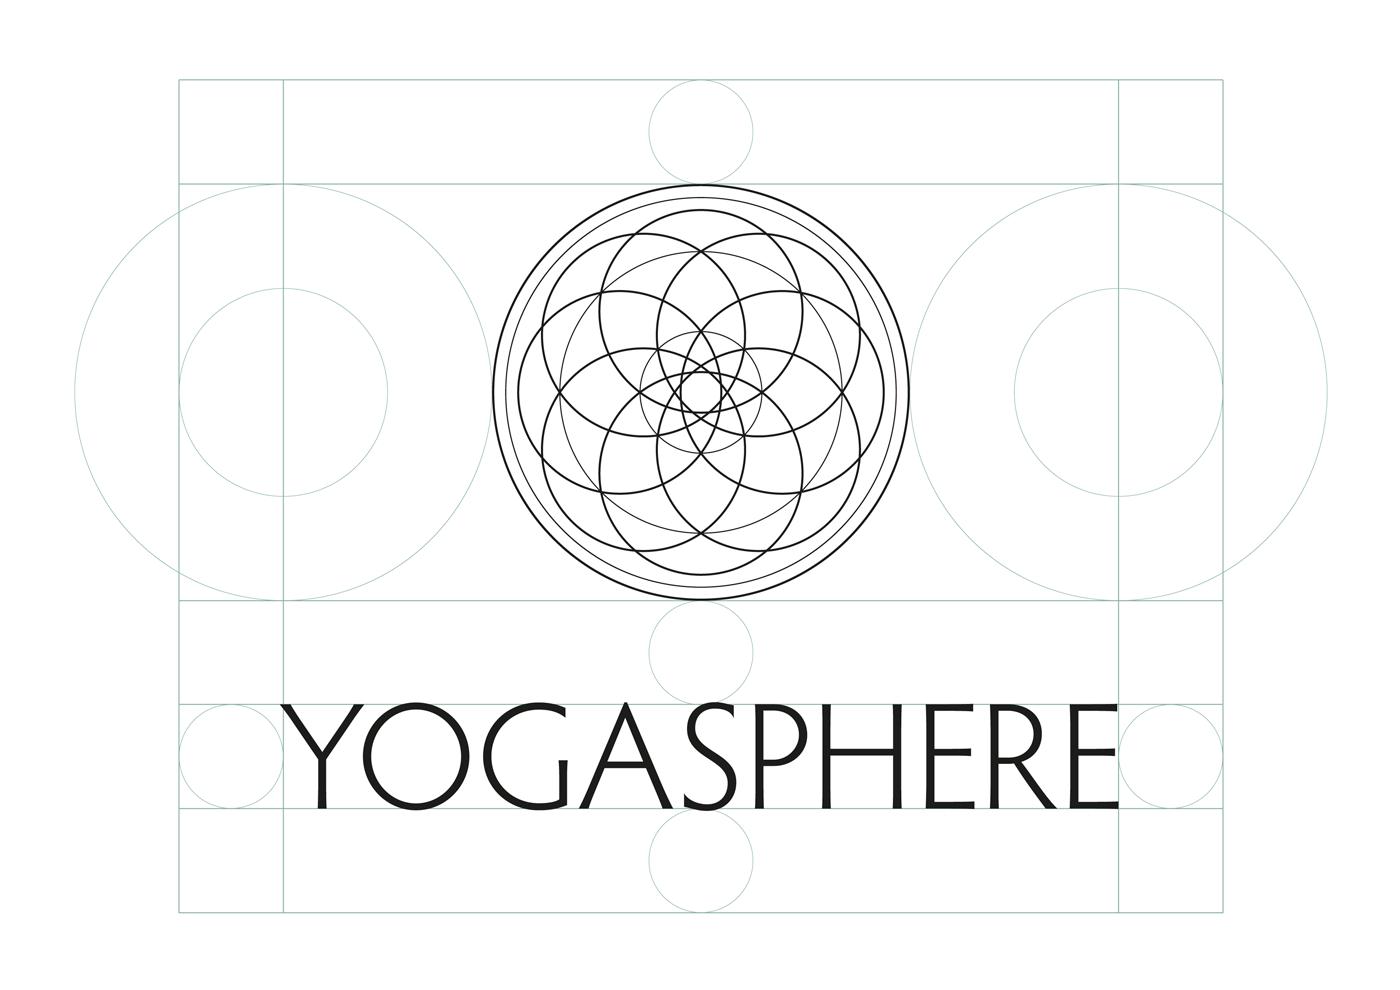 Yogasphere - Logo geometry insight